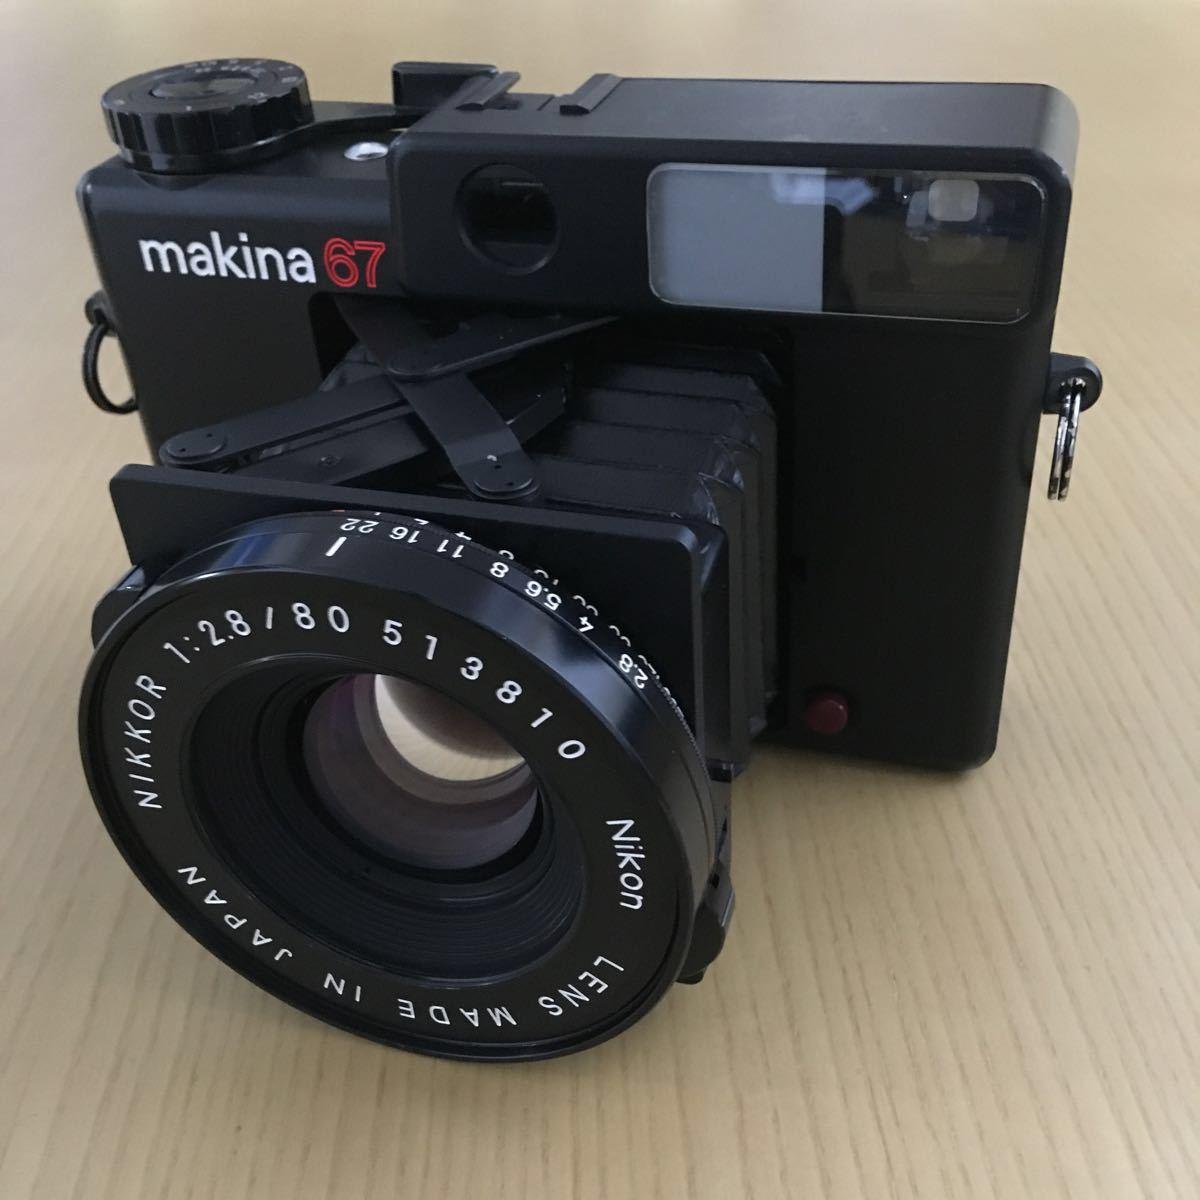 PLAUBEL makina 67 (Nikon Nikkor 80mm f2.8)プラウベル・マキナ 中判カメラ 完動品 シャッター切れスピード変化し露出計も動作しました。_画像2